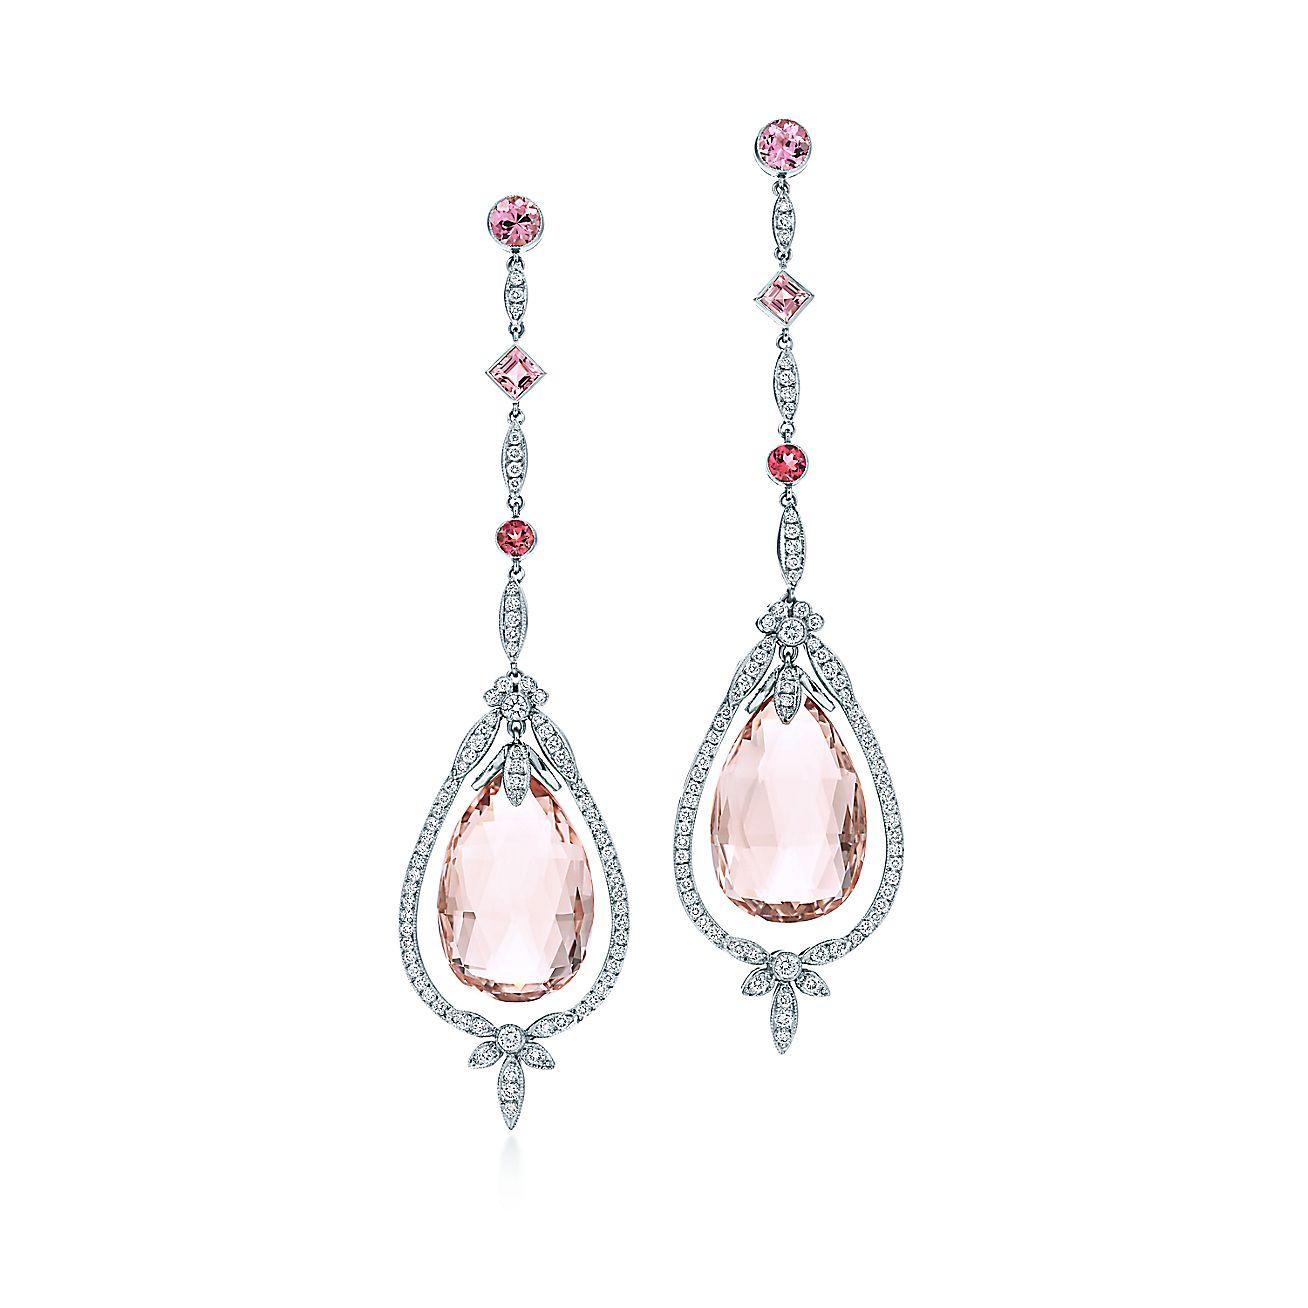 Morganite teardrop and diamond earrings with pink